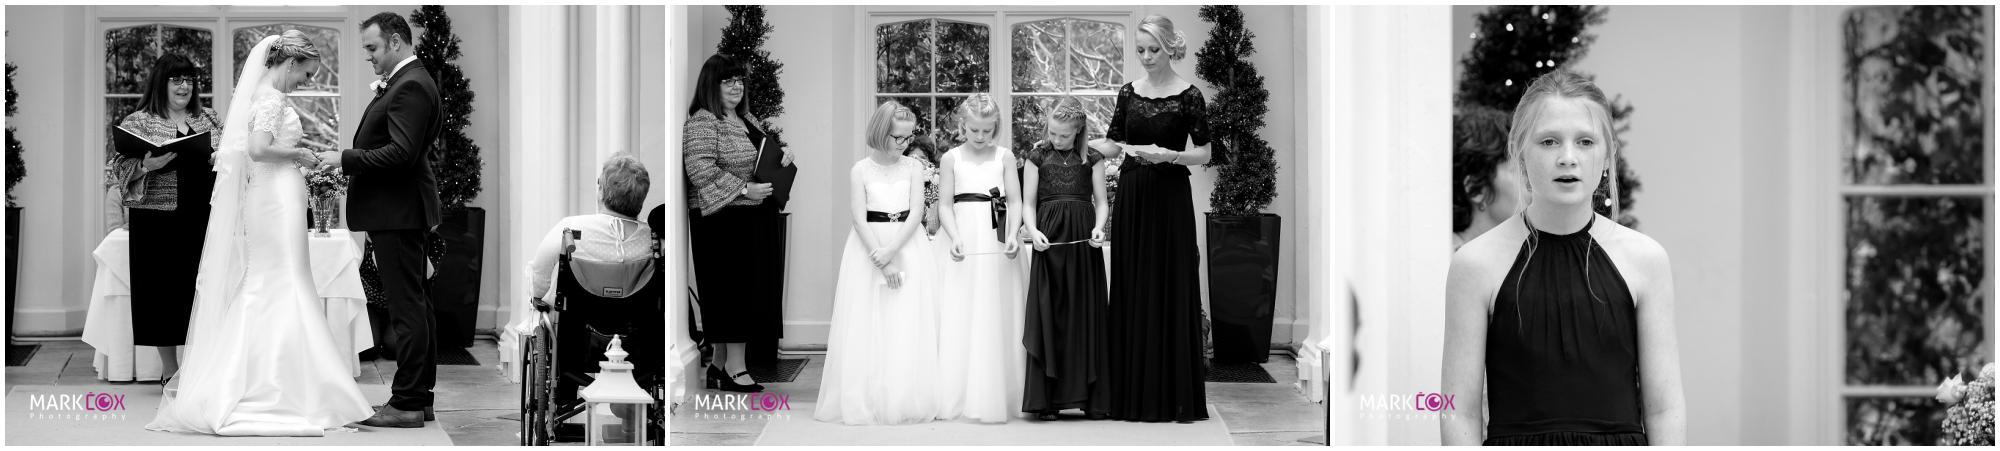 St Audries Park Wedding Photographer - Somerset Wedding Photographer-008